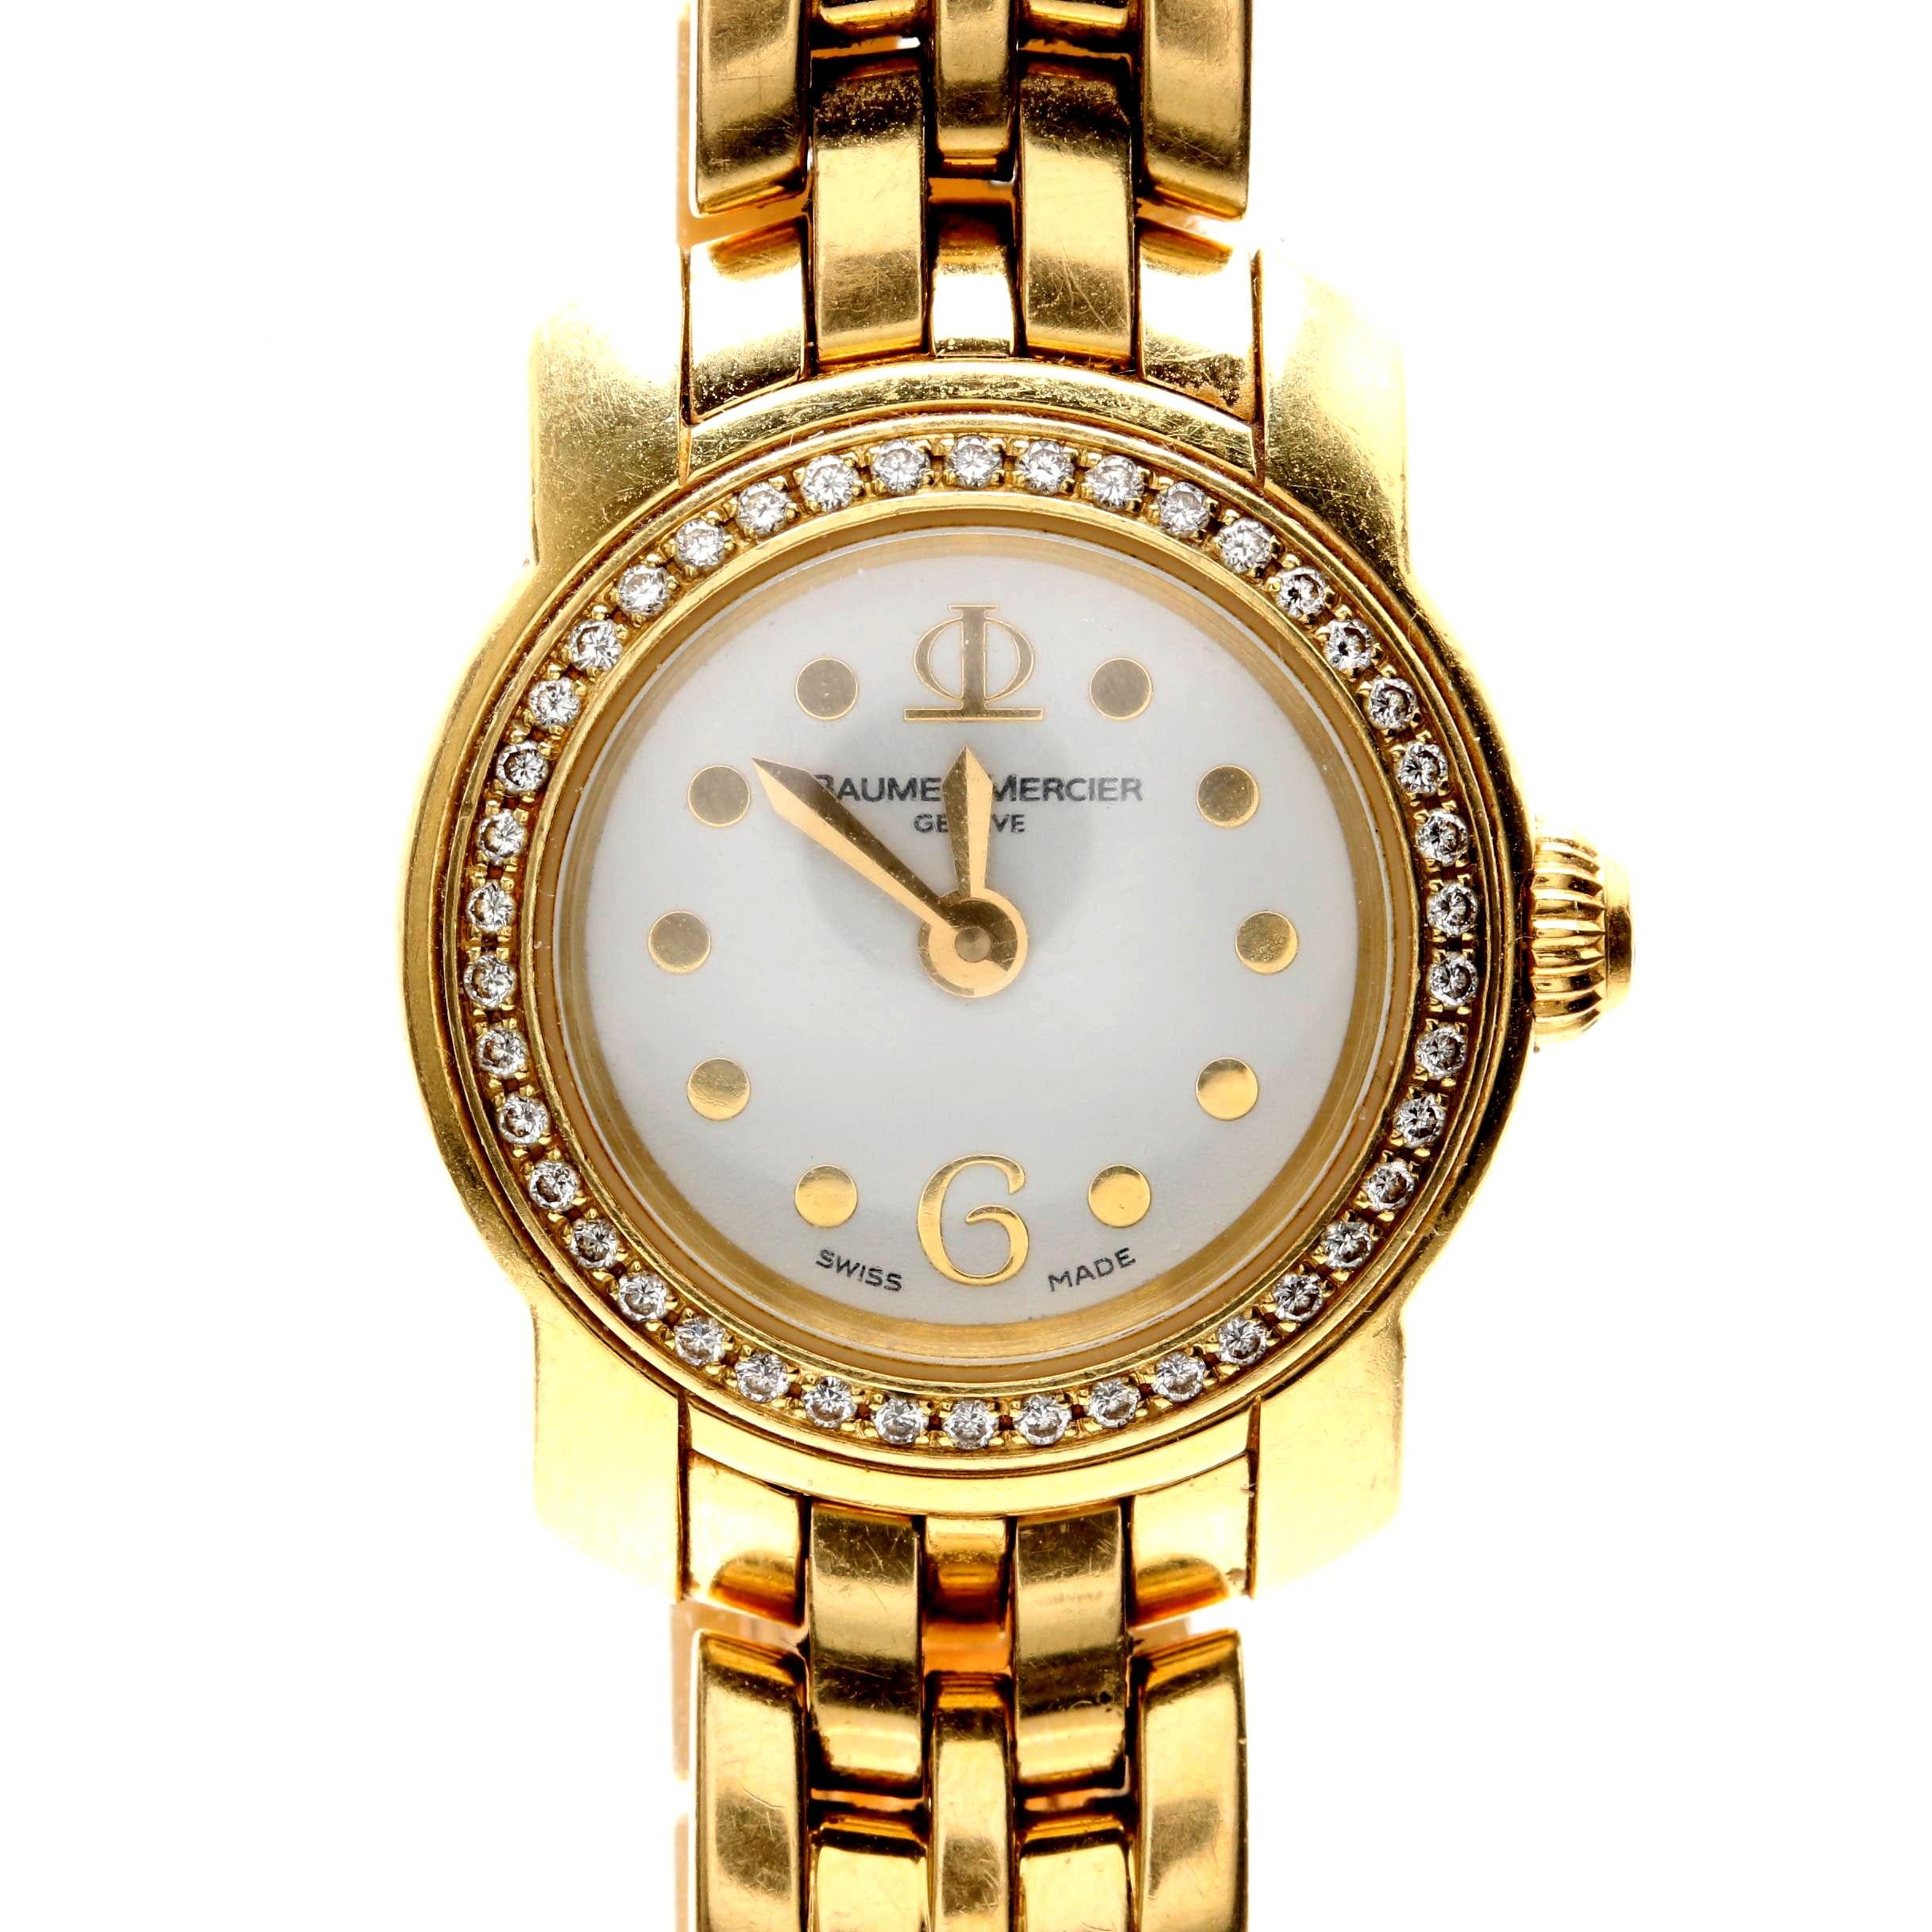 Baume & Mercier 18K Yellow Gold and Diamond Wristwatch